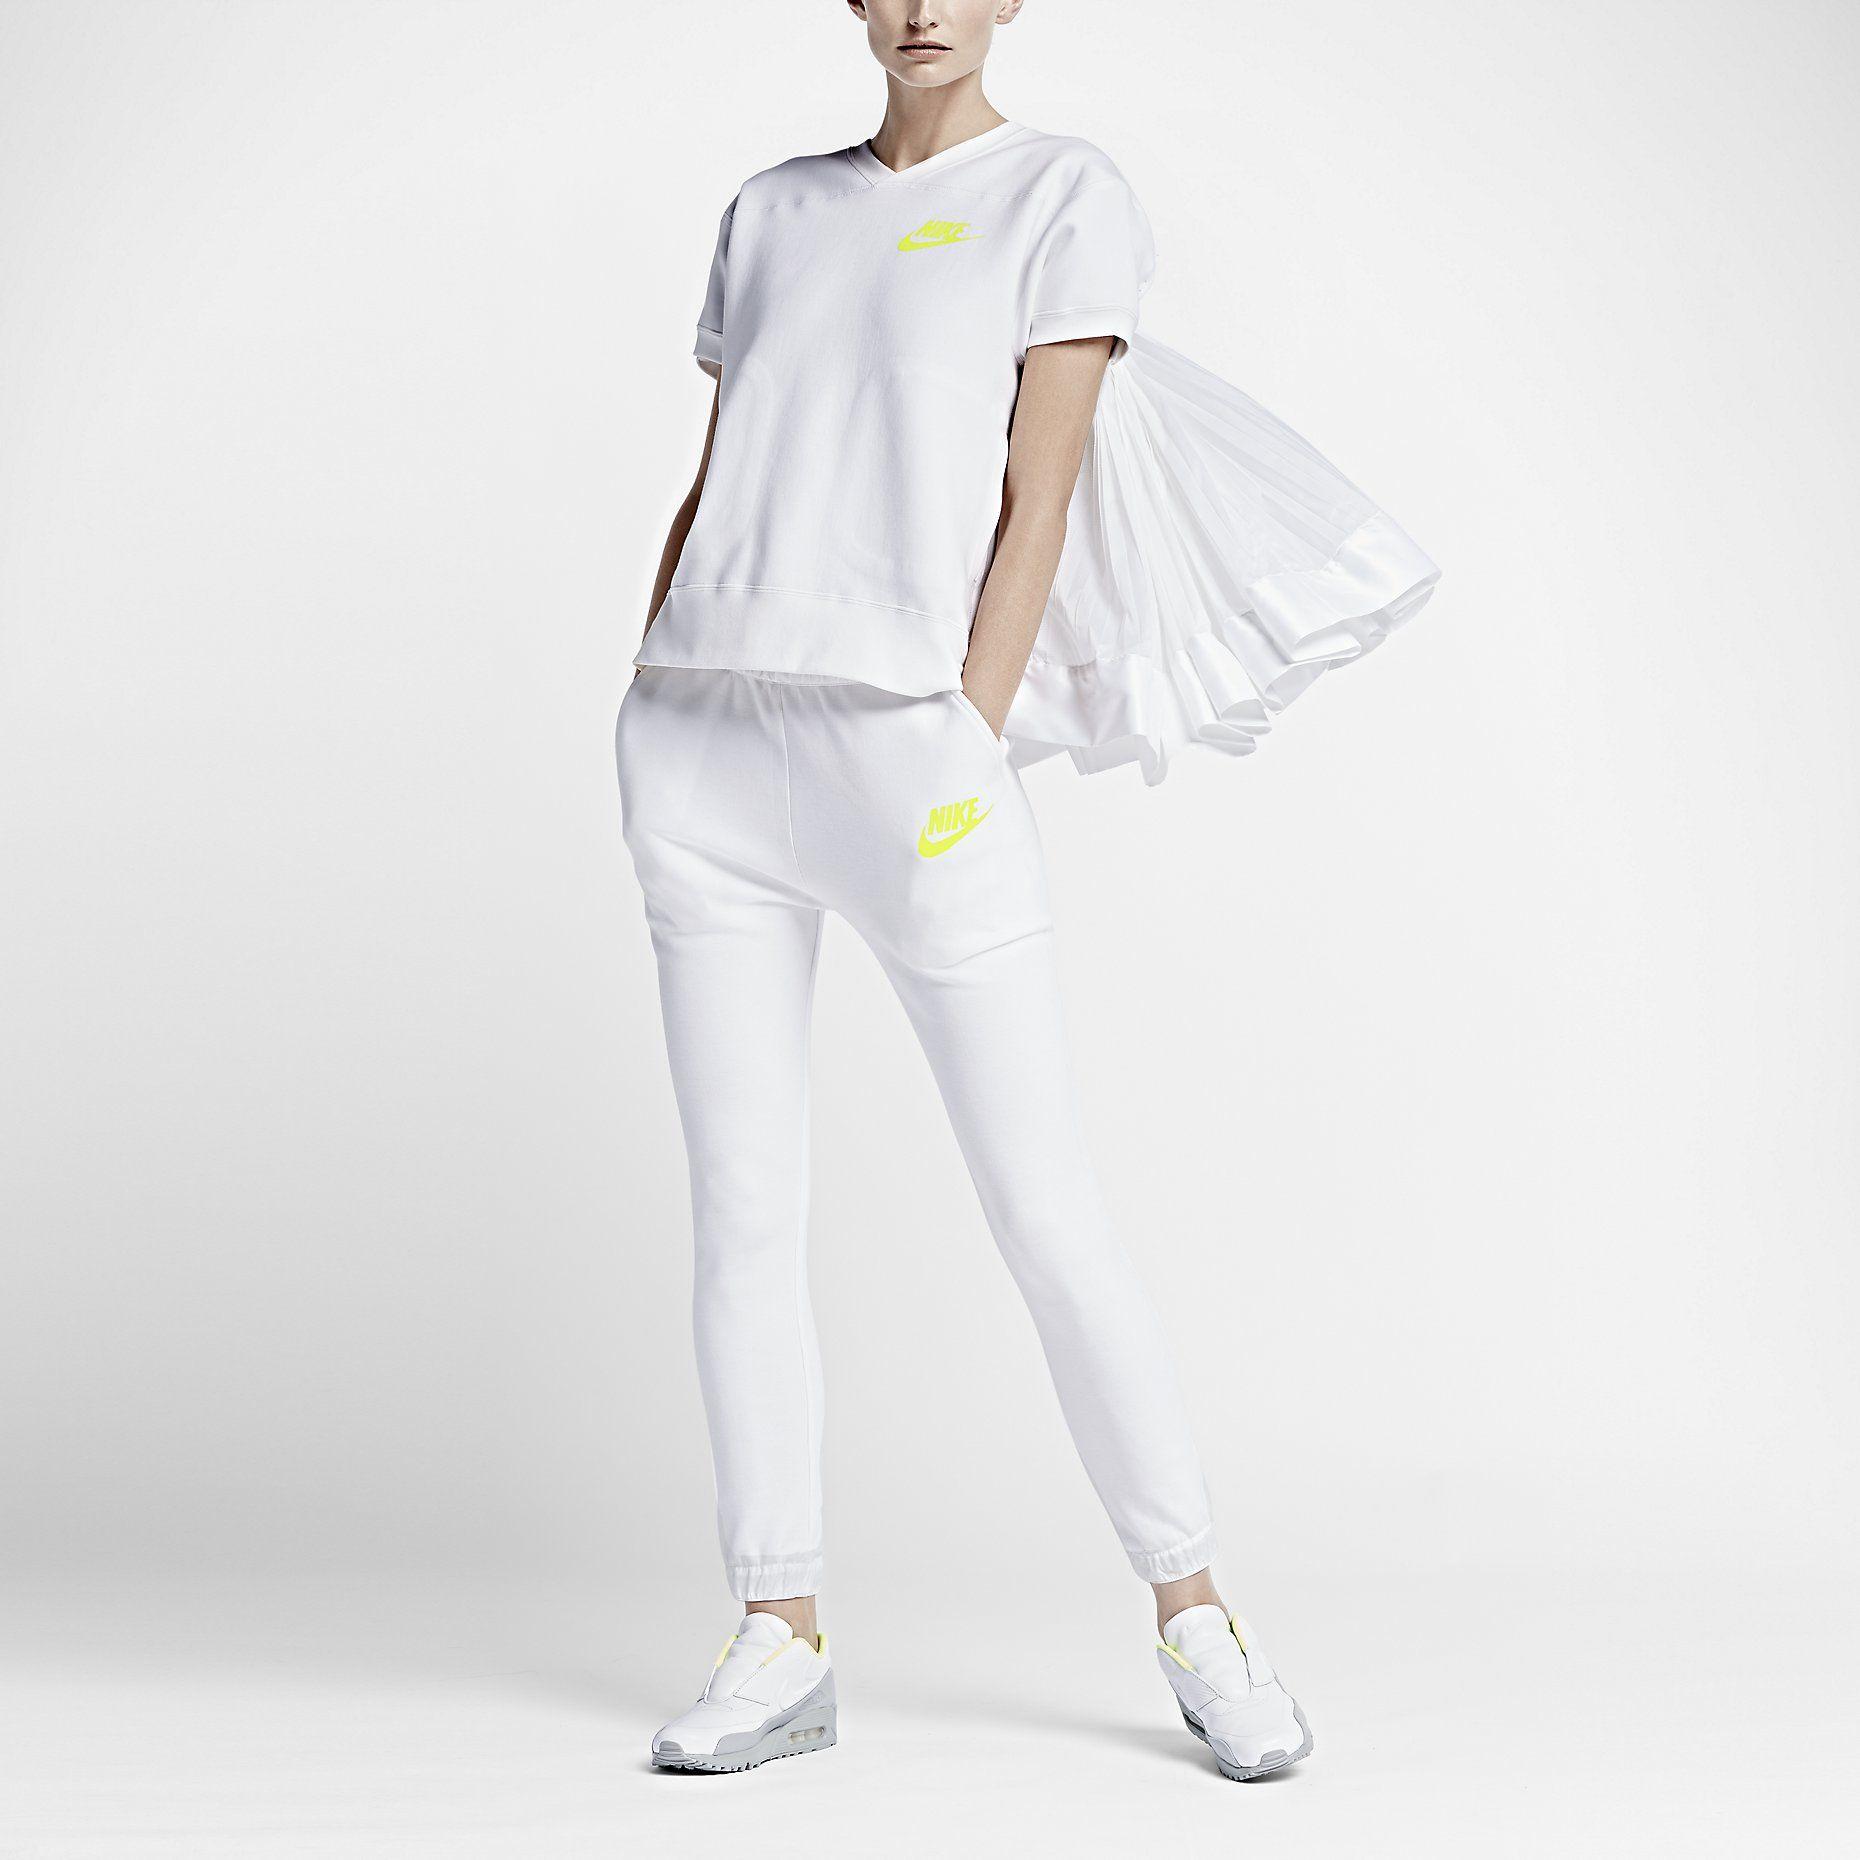 NikeLab x sacai Tech Fleece Short Sleeve Crew Women's